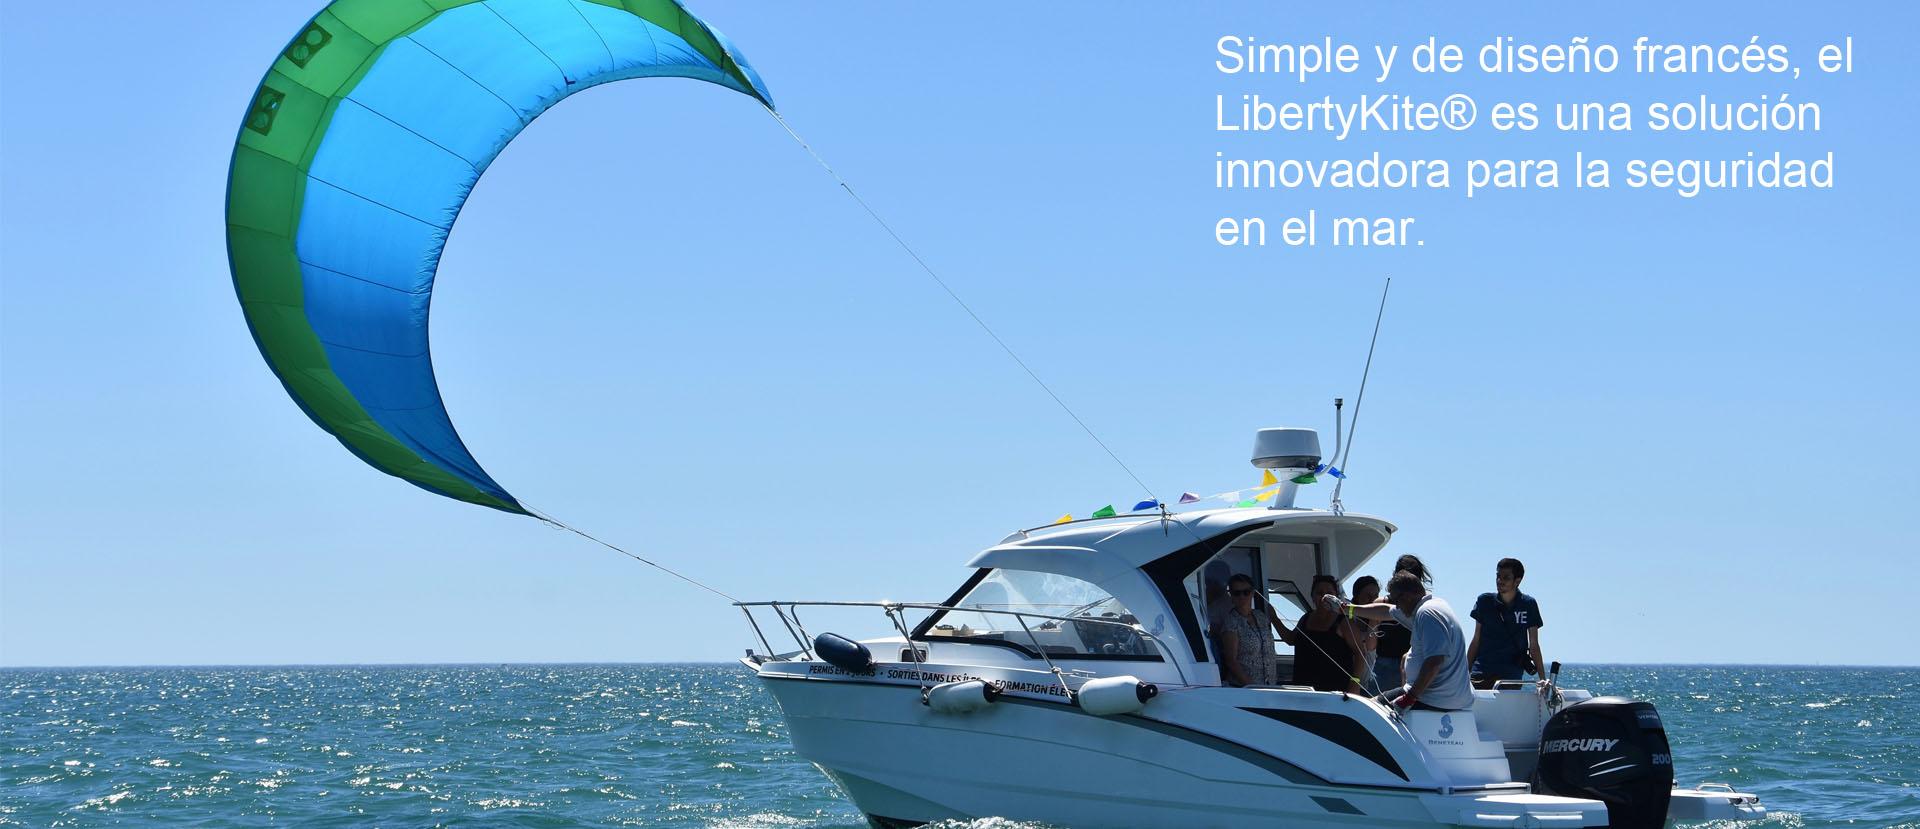 liberty-kite-bateau-21-es